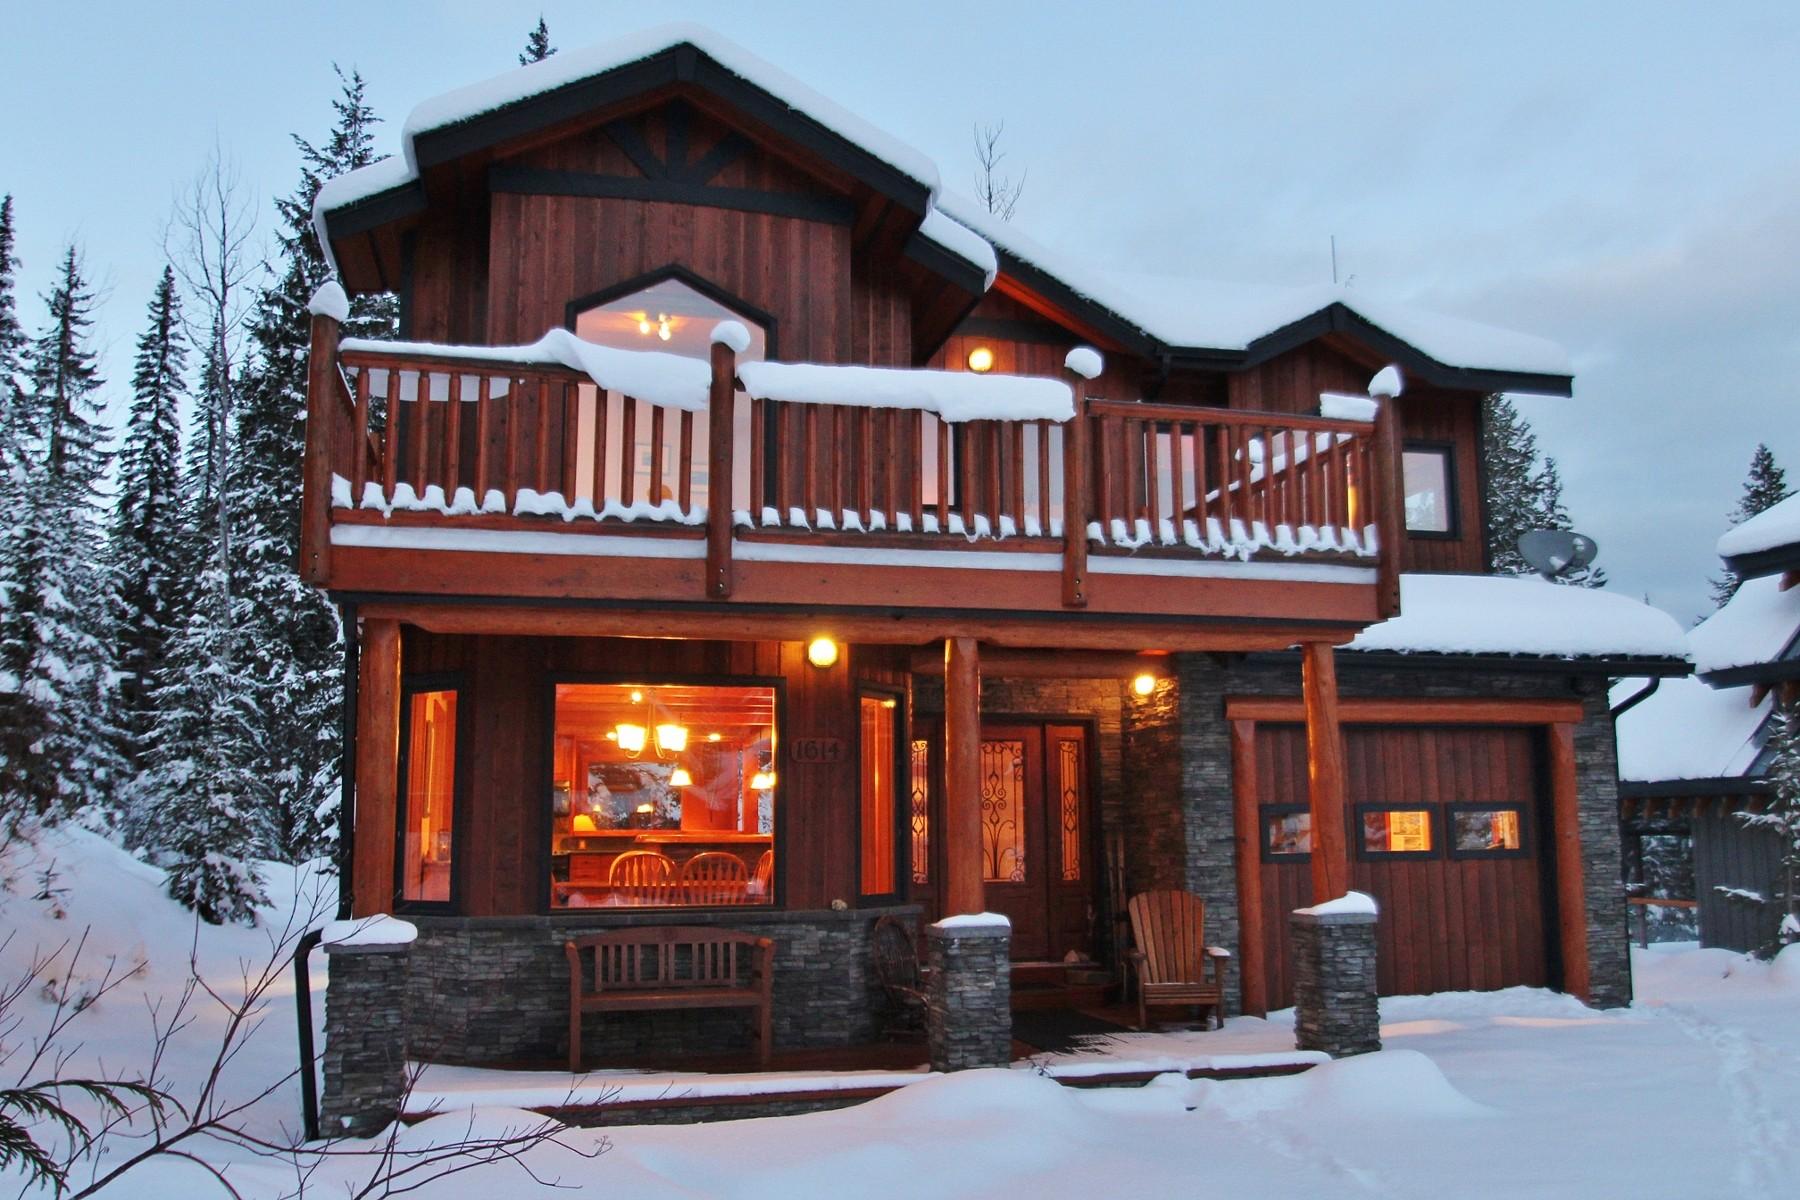 Villa per Vendita alle ore Cedar Creek Cabin in the Woods 1614 Purcell Woods Golden, Columbia Britannica V0A1H0 Canada